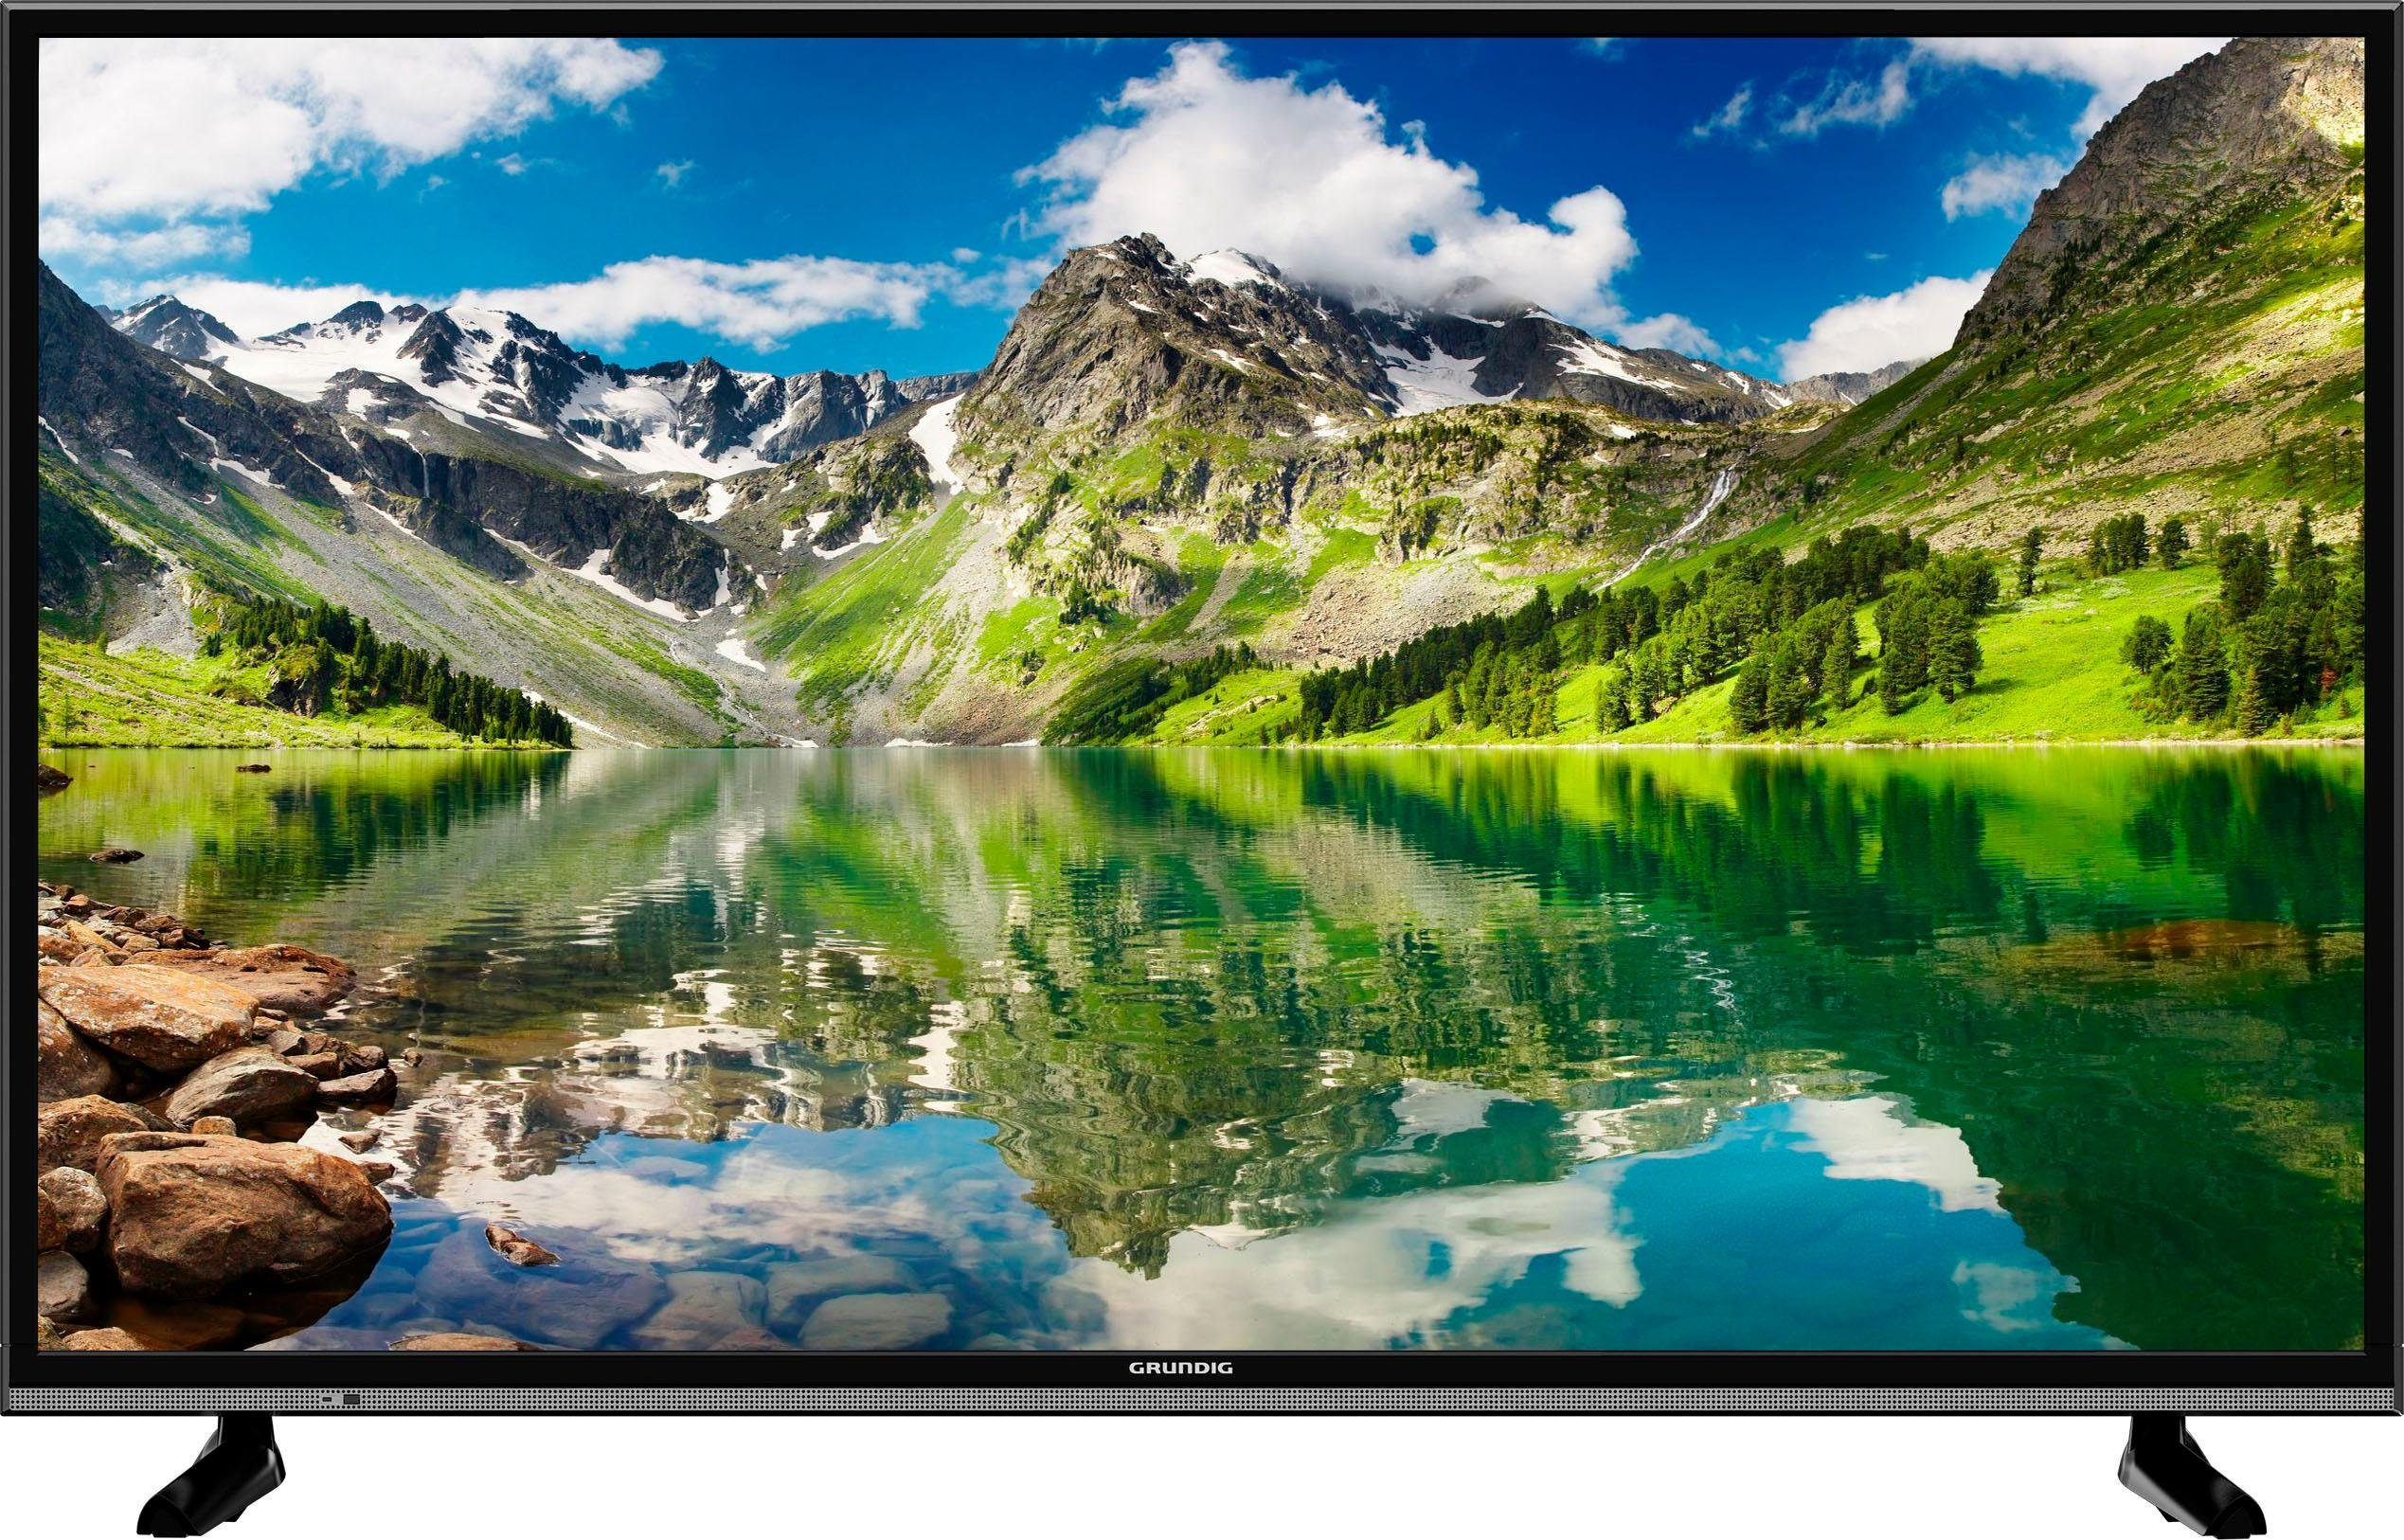 Grundig 49 VLX 8000 BP LED-Fernseher (123 cm/49 Zoll, 4K Ultra HD, Smart-TV)